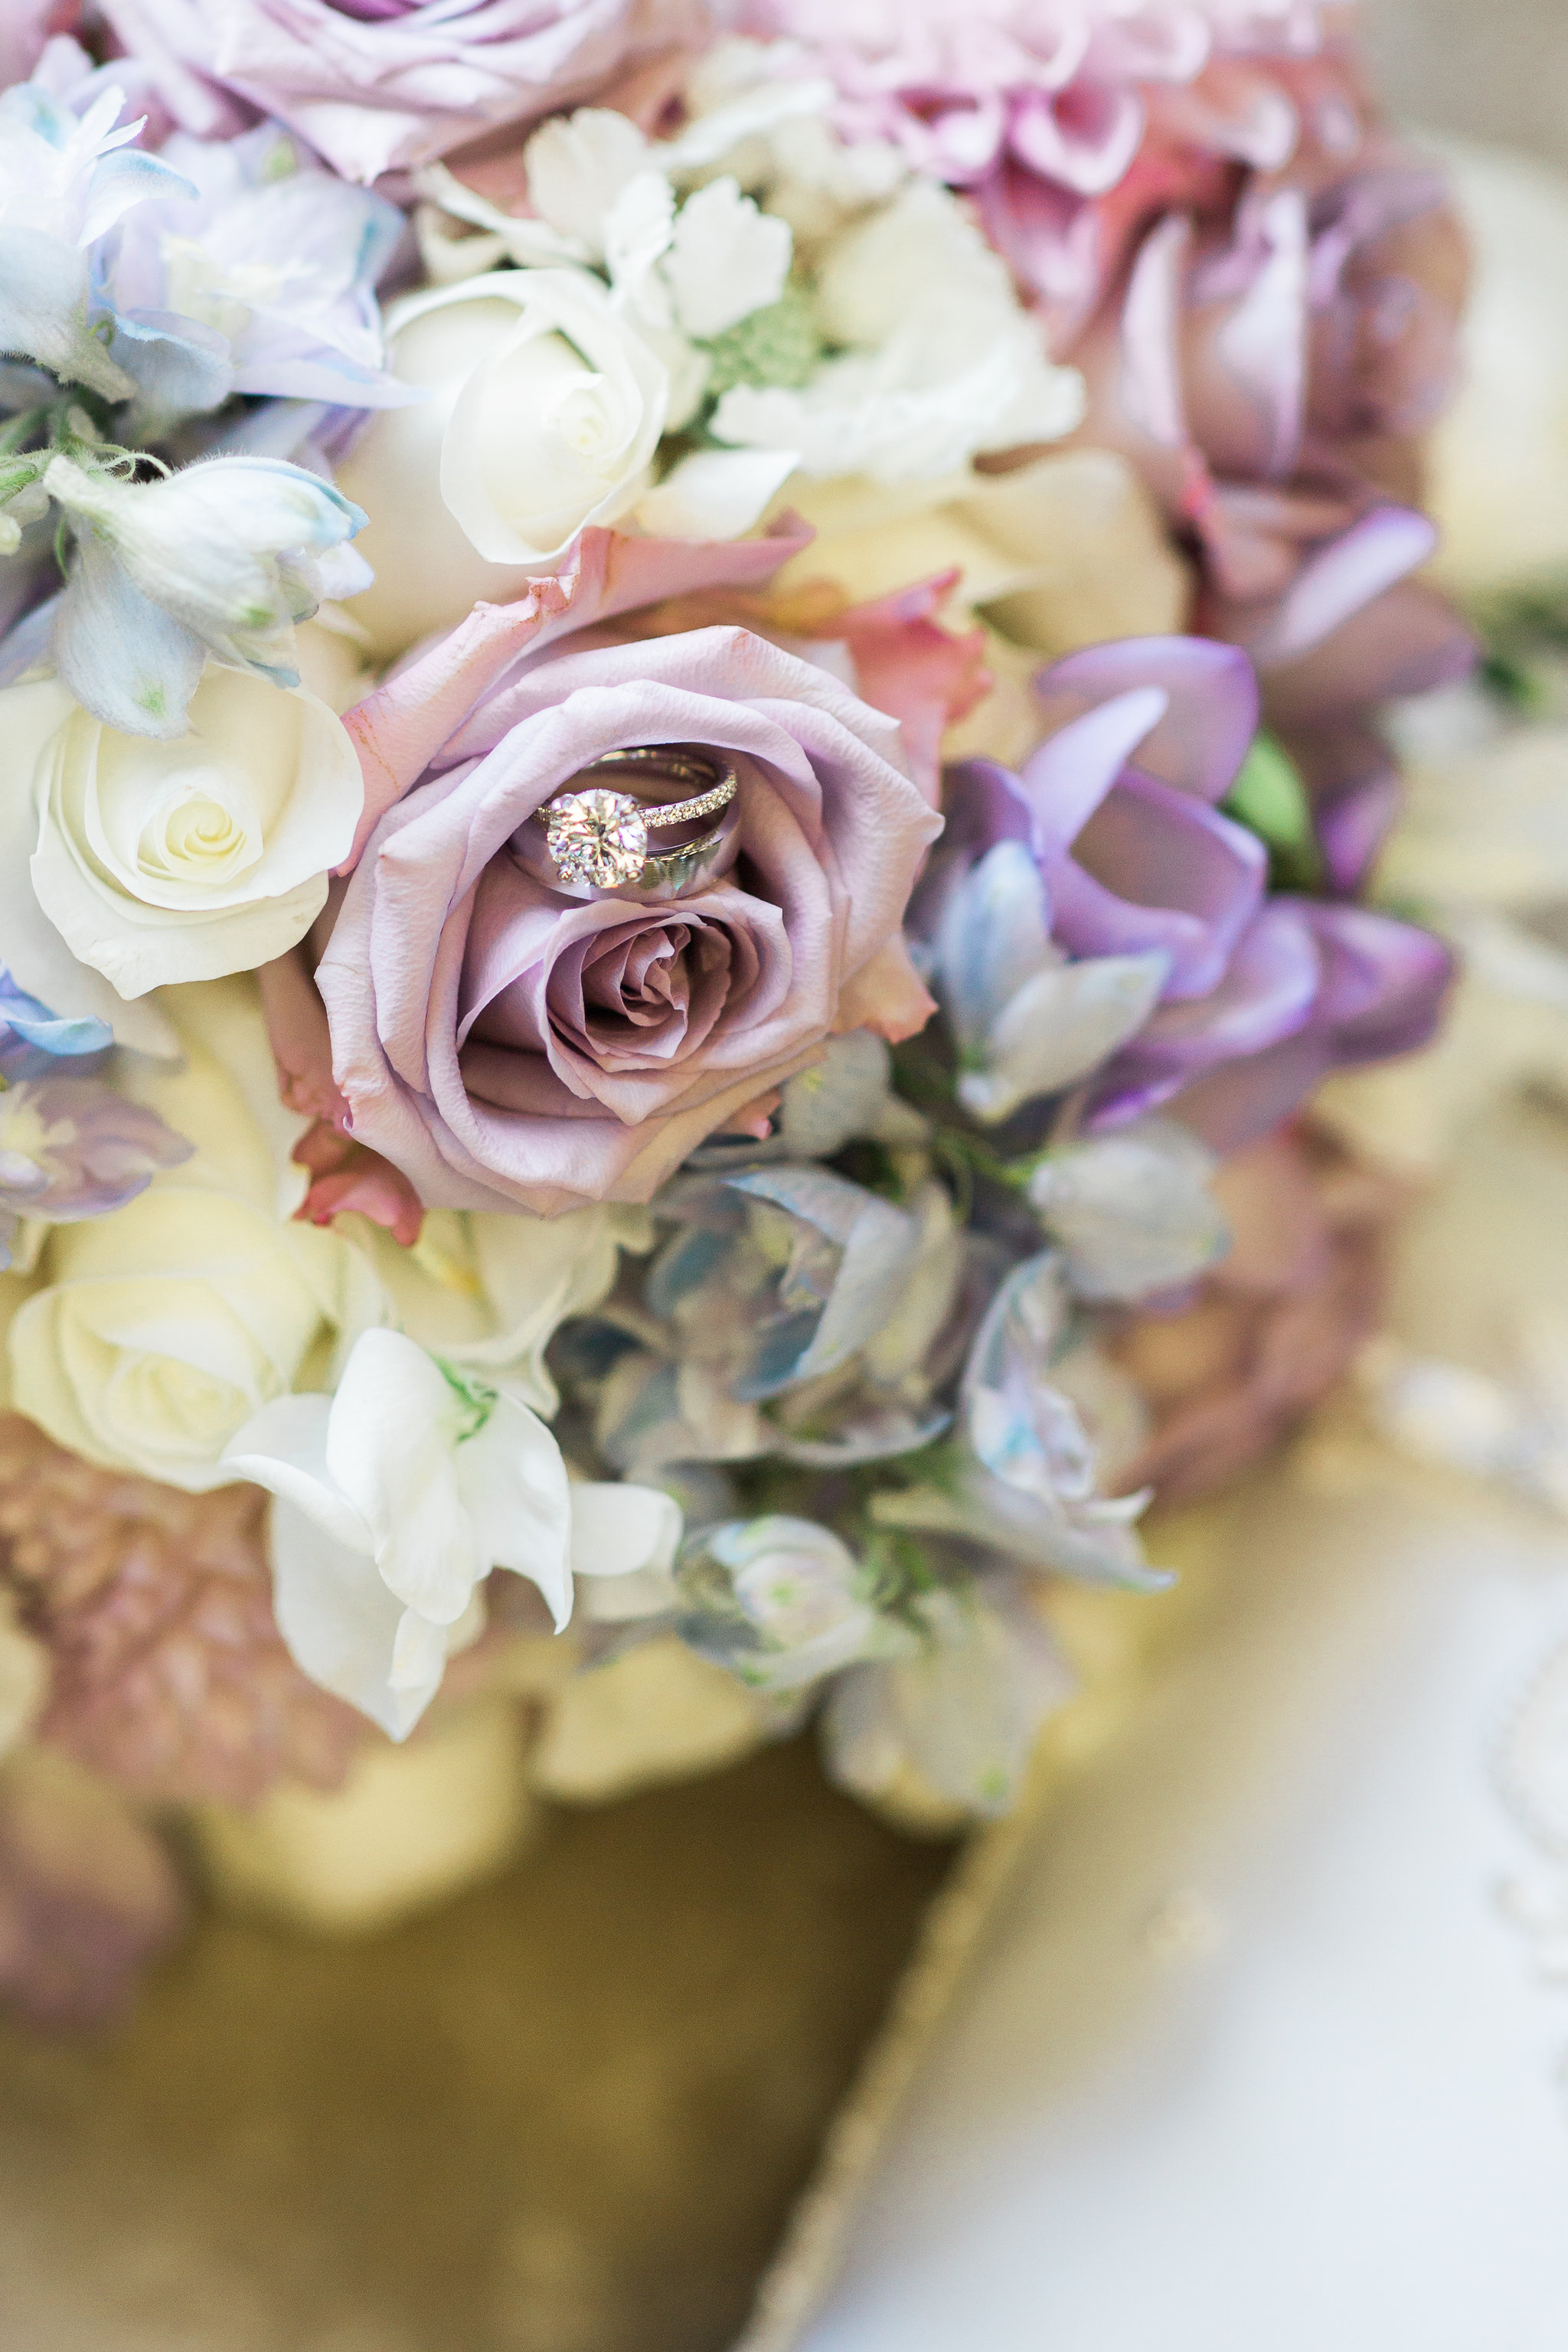 Beverly Hills Courthouse Elopement Wedding Joy Theory Co Photography Los Angeles LA Wedding Photographer